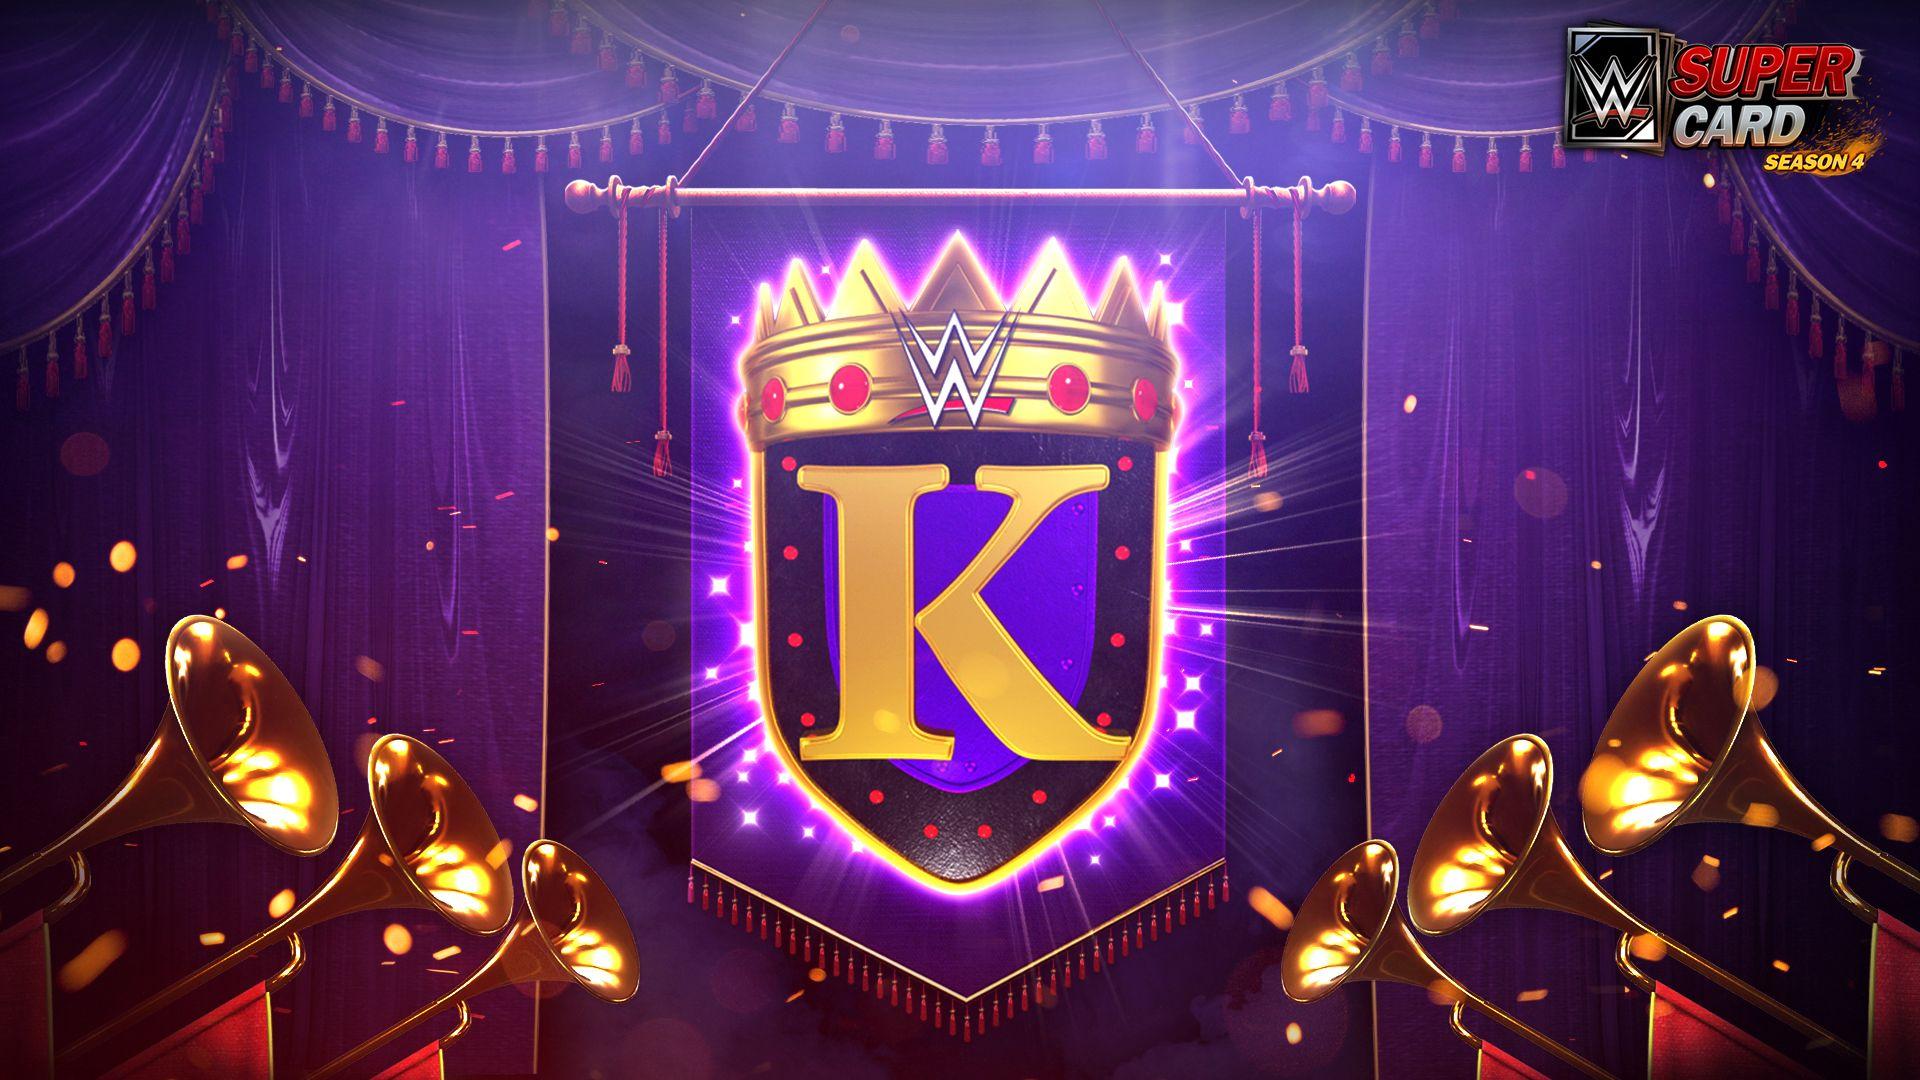 Wwe Supercard News Aperçu De La Saison 4 King Of The Ring 20